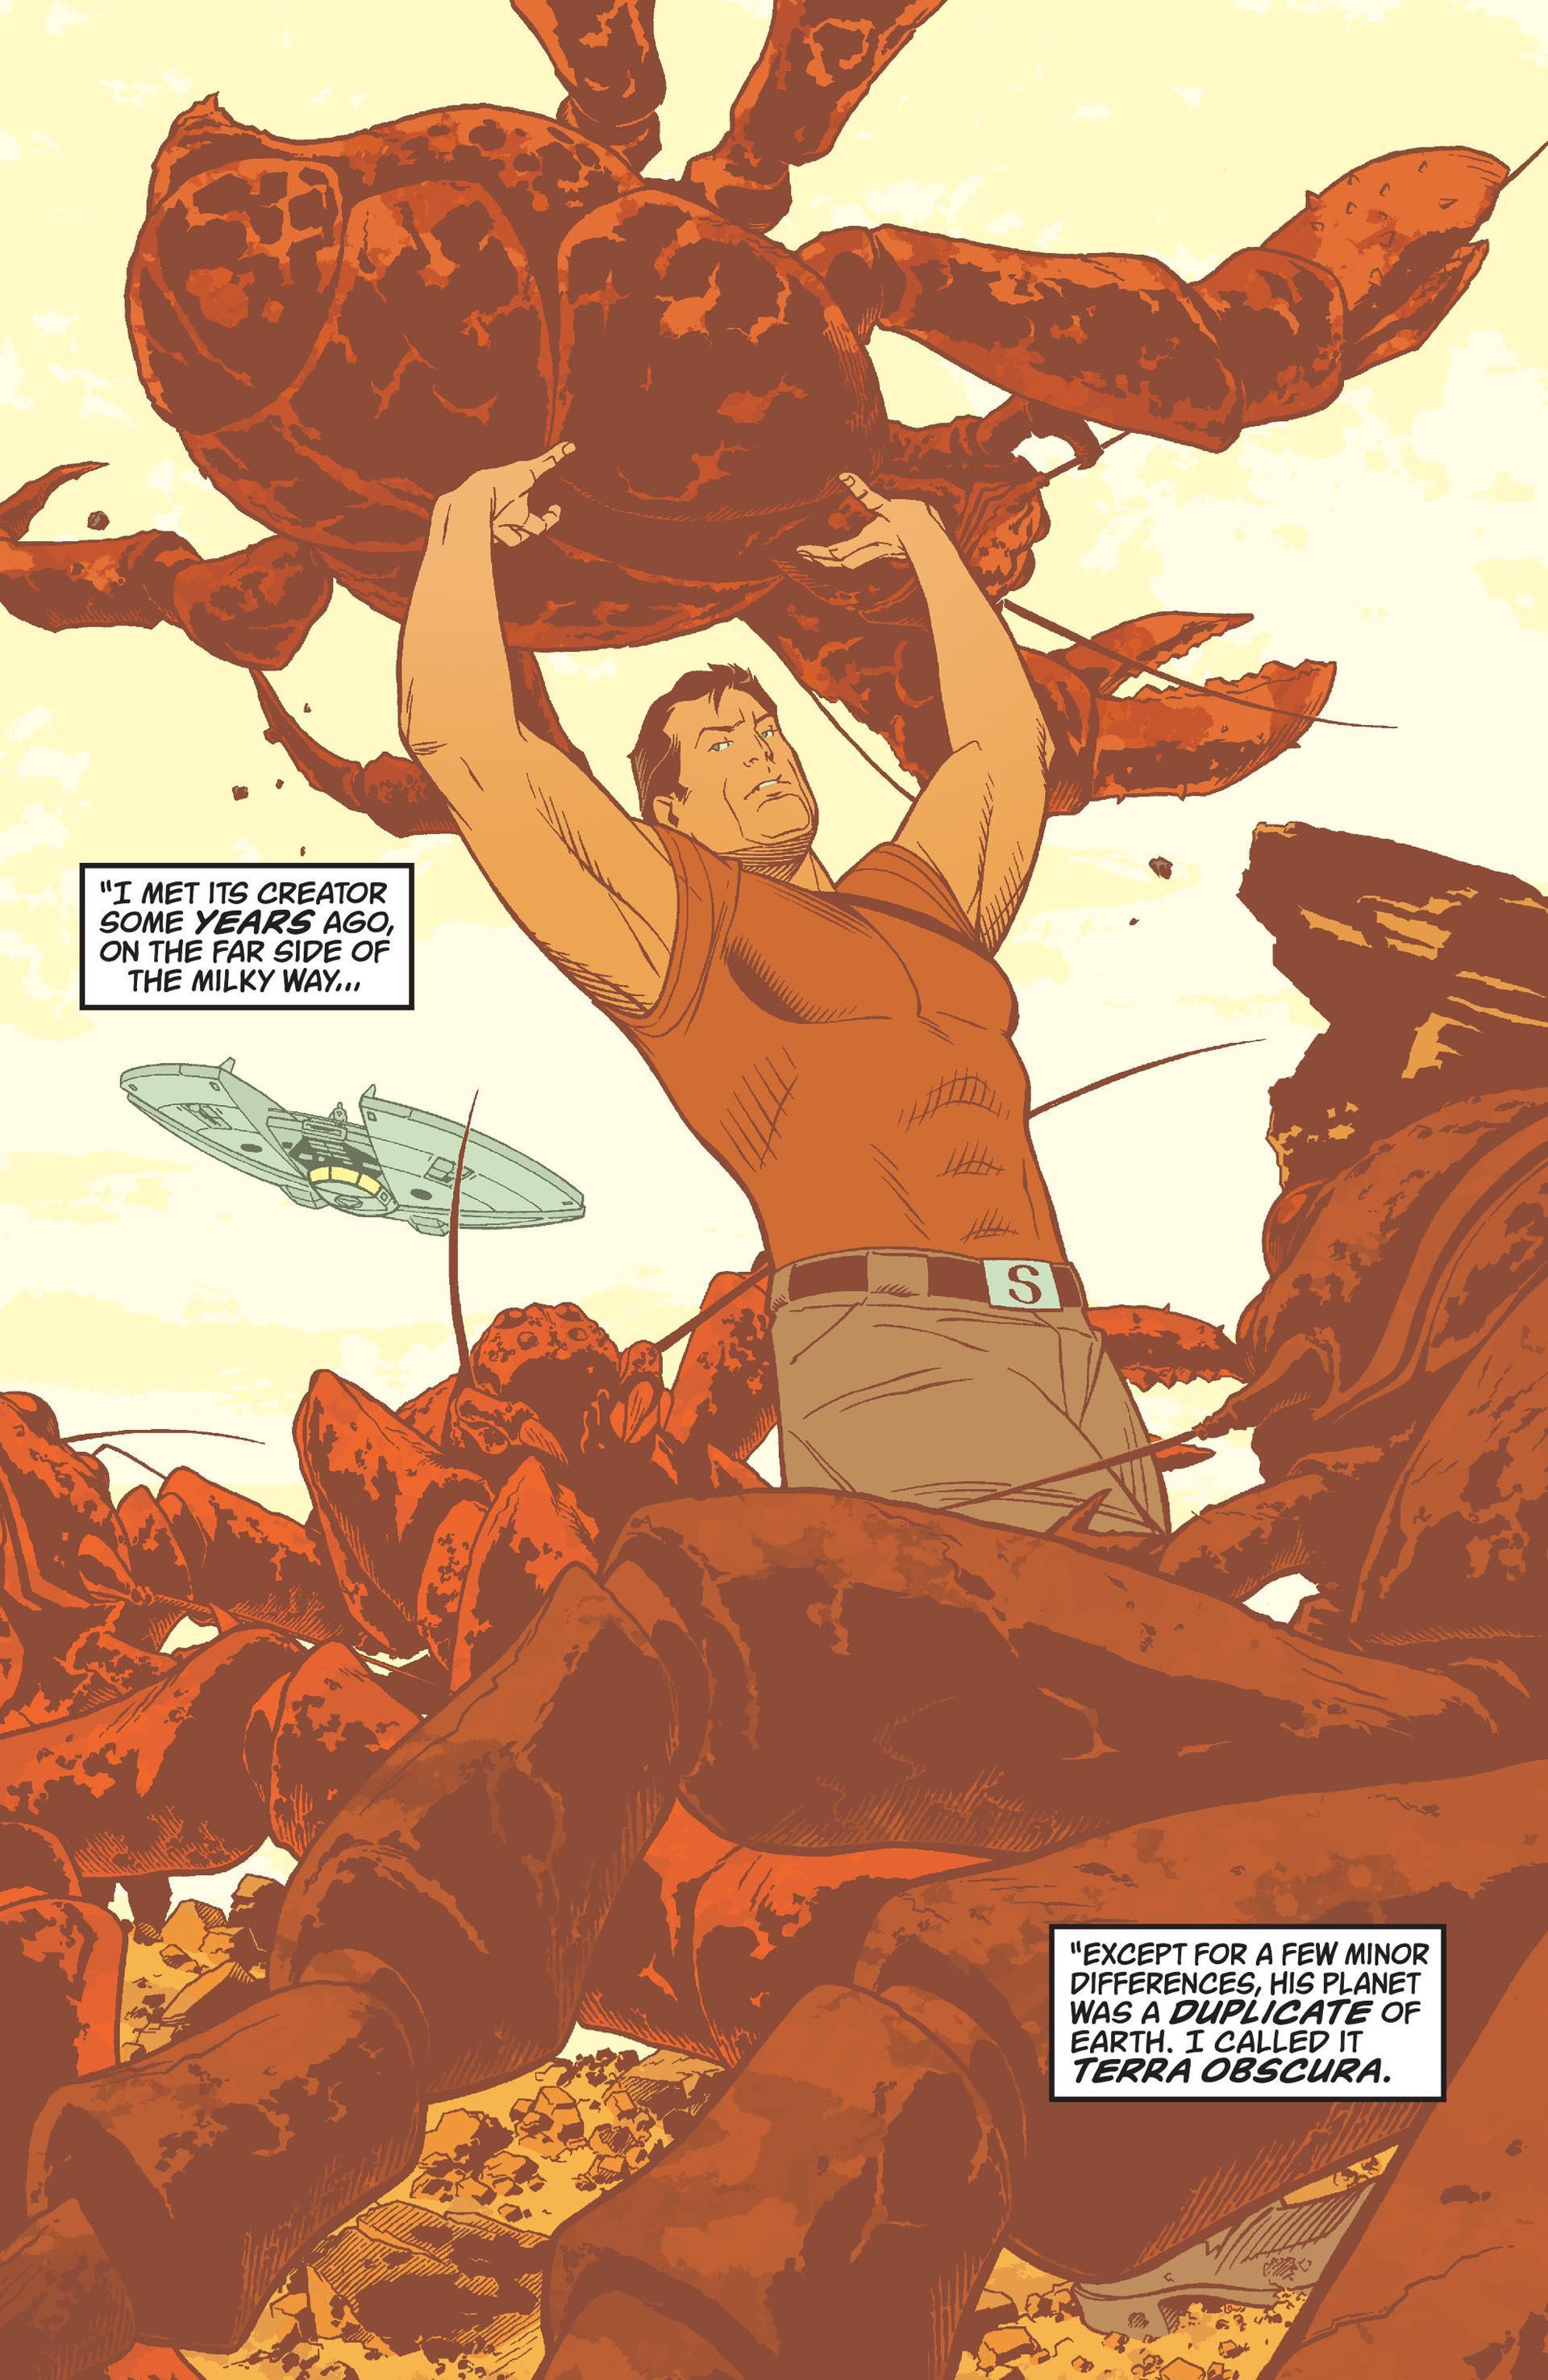 Doc Strange America/'s Best Comics #4 Photocopy Comic Book The Black Terror